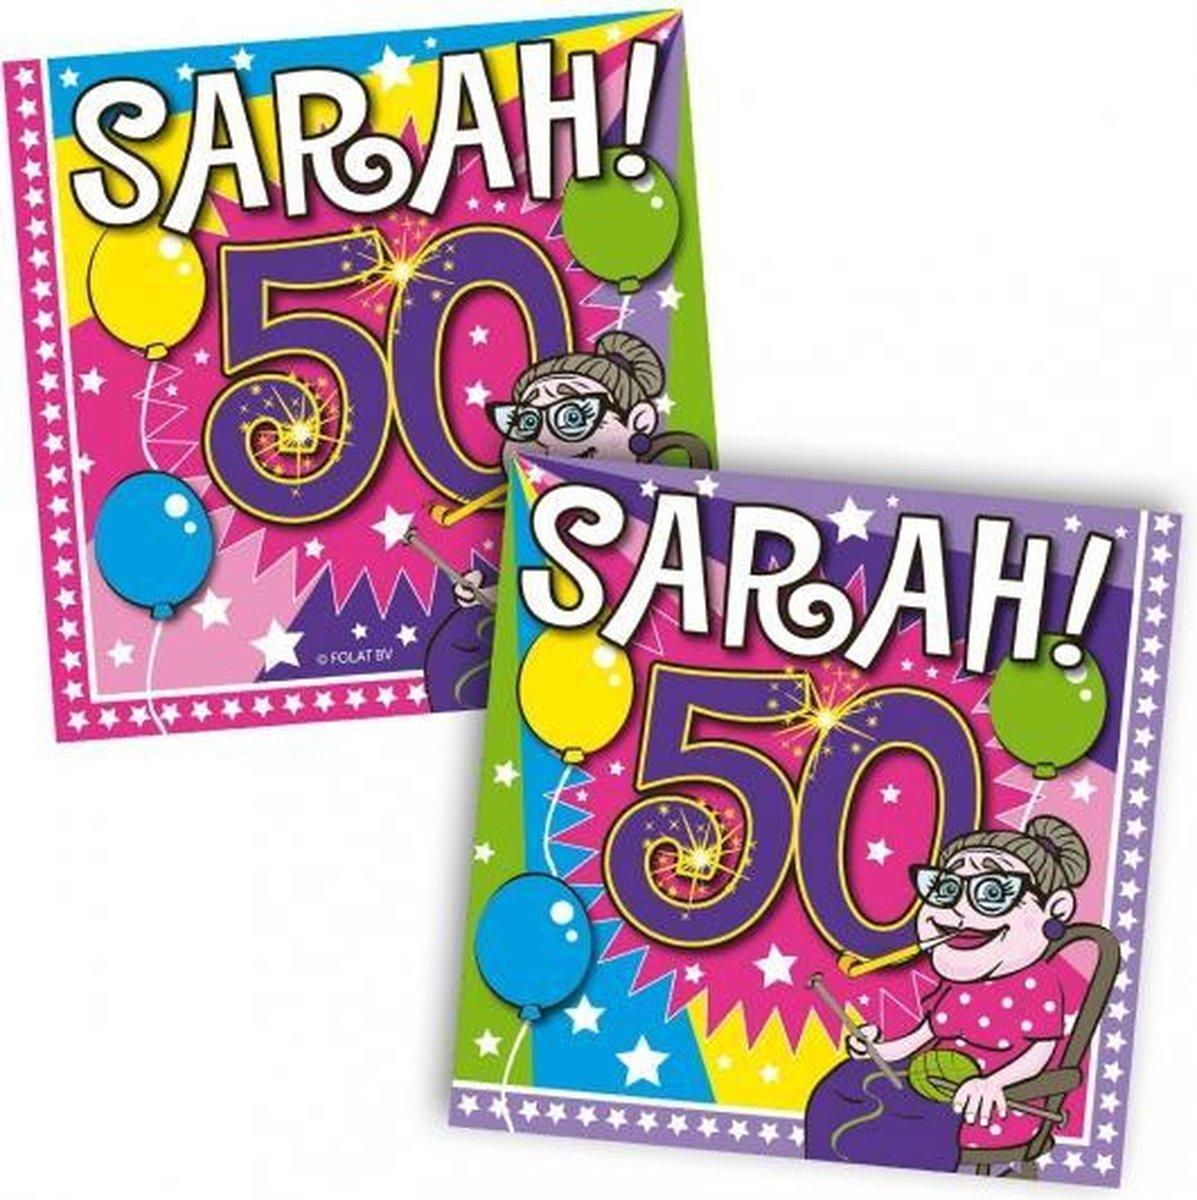 Sarah 50 jaar servetten - Folat